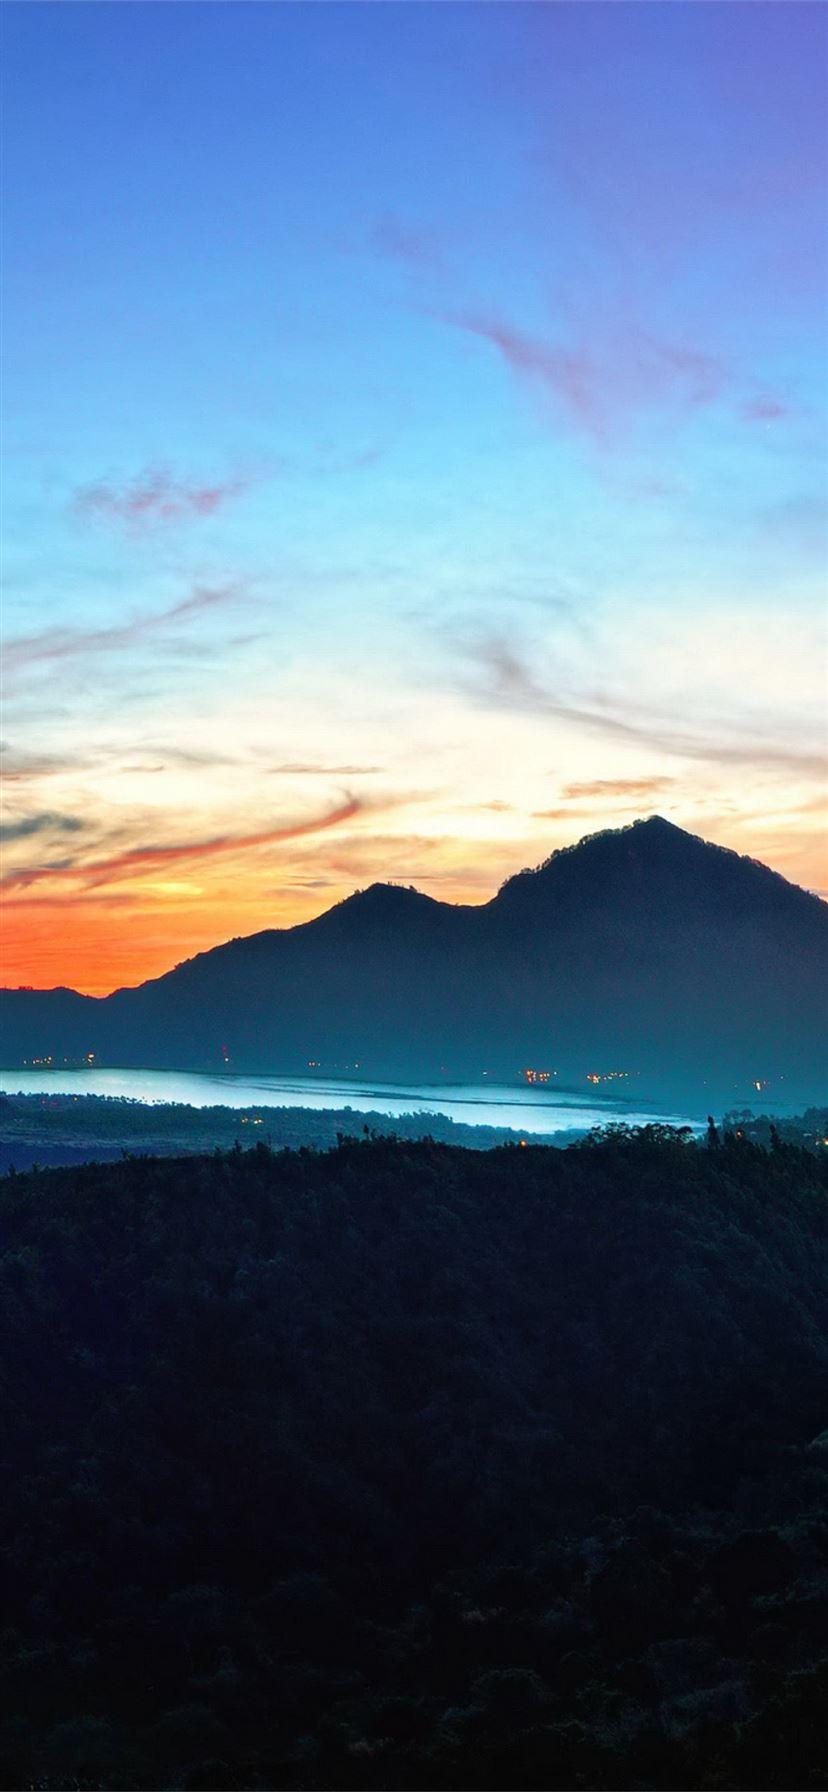 Best Indonesia Iphone 11 Wallpapers Hd Ilikewallpaper